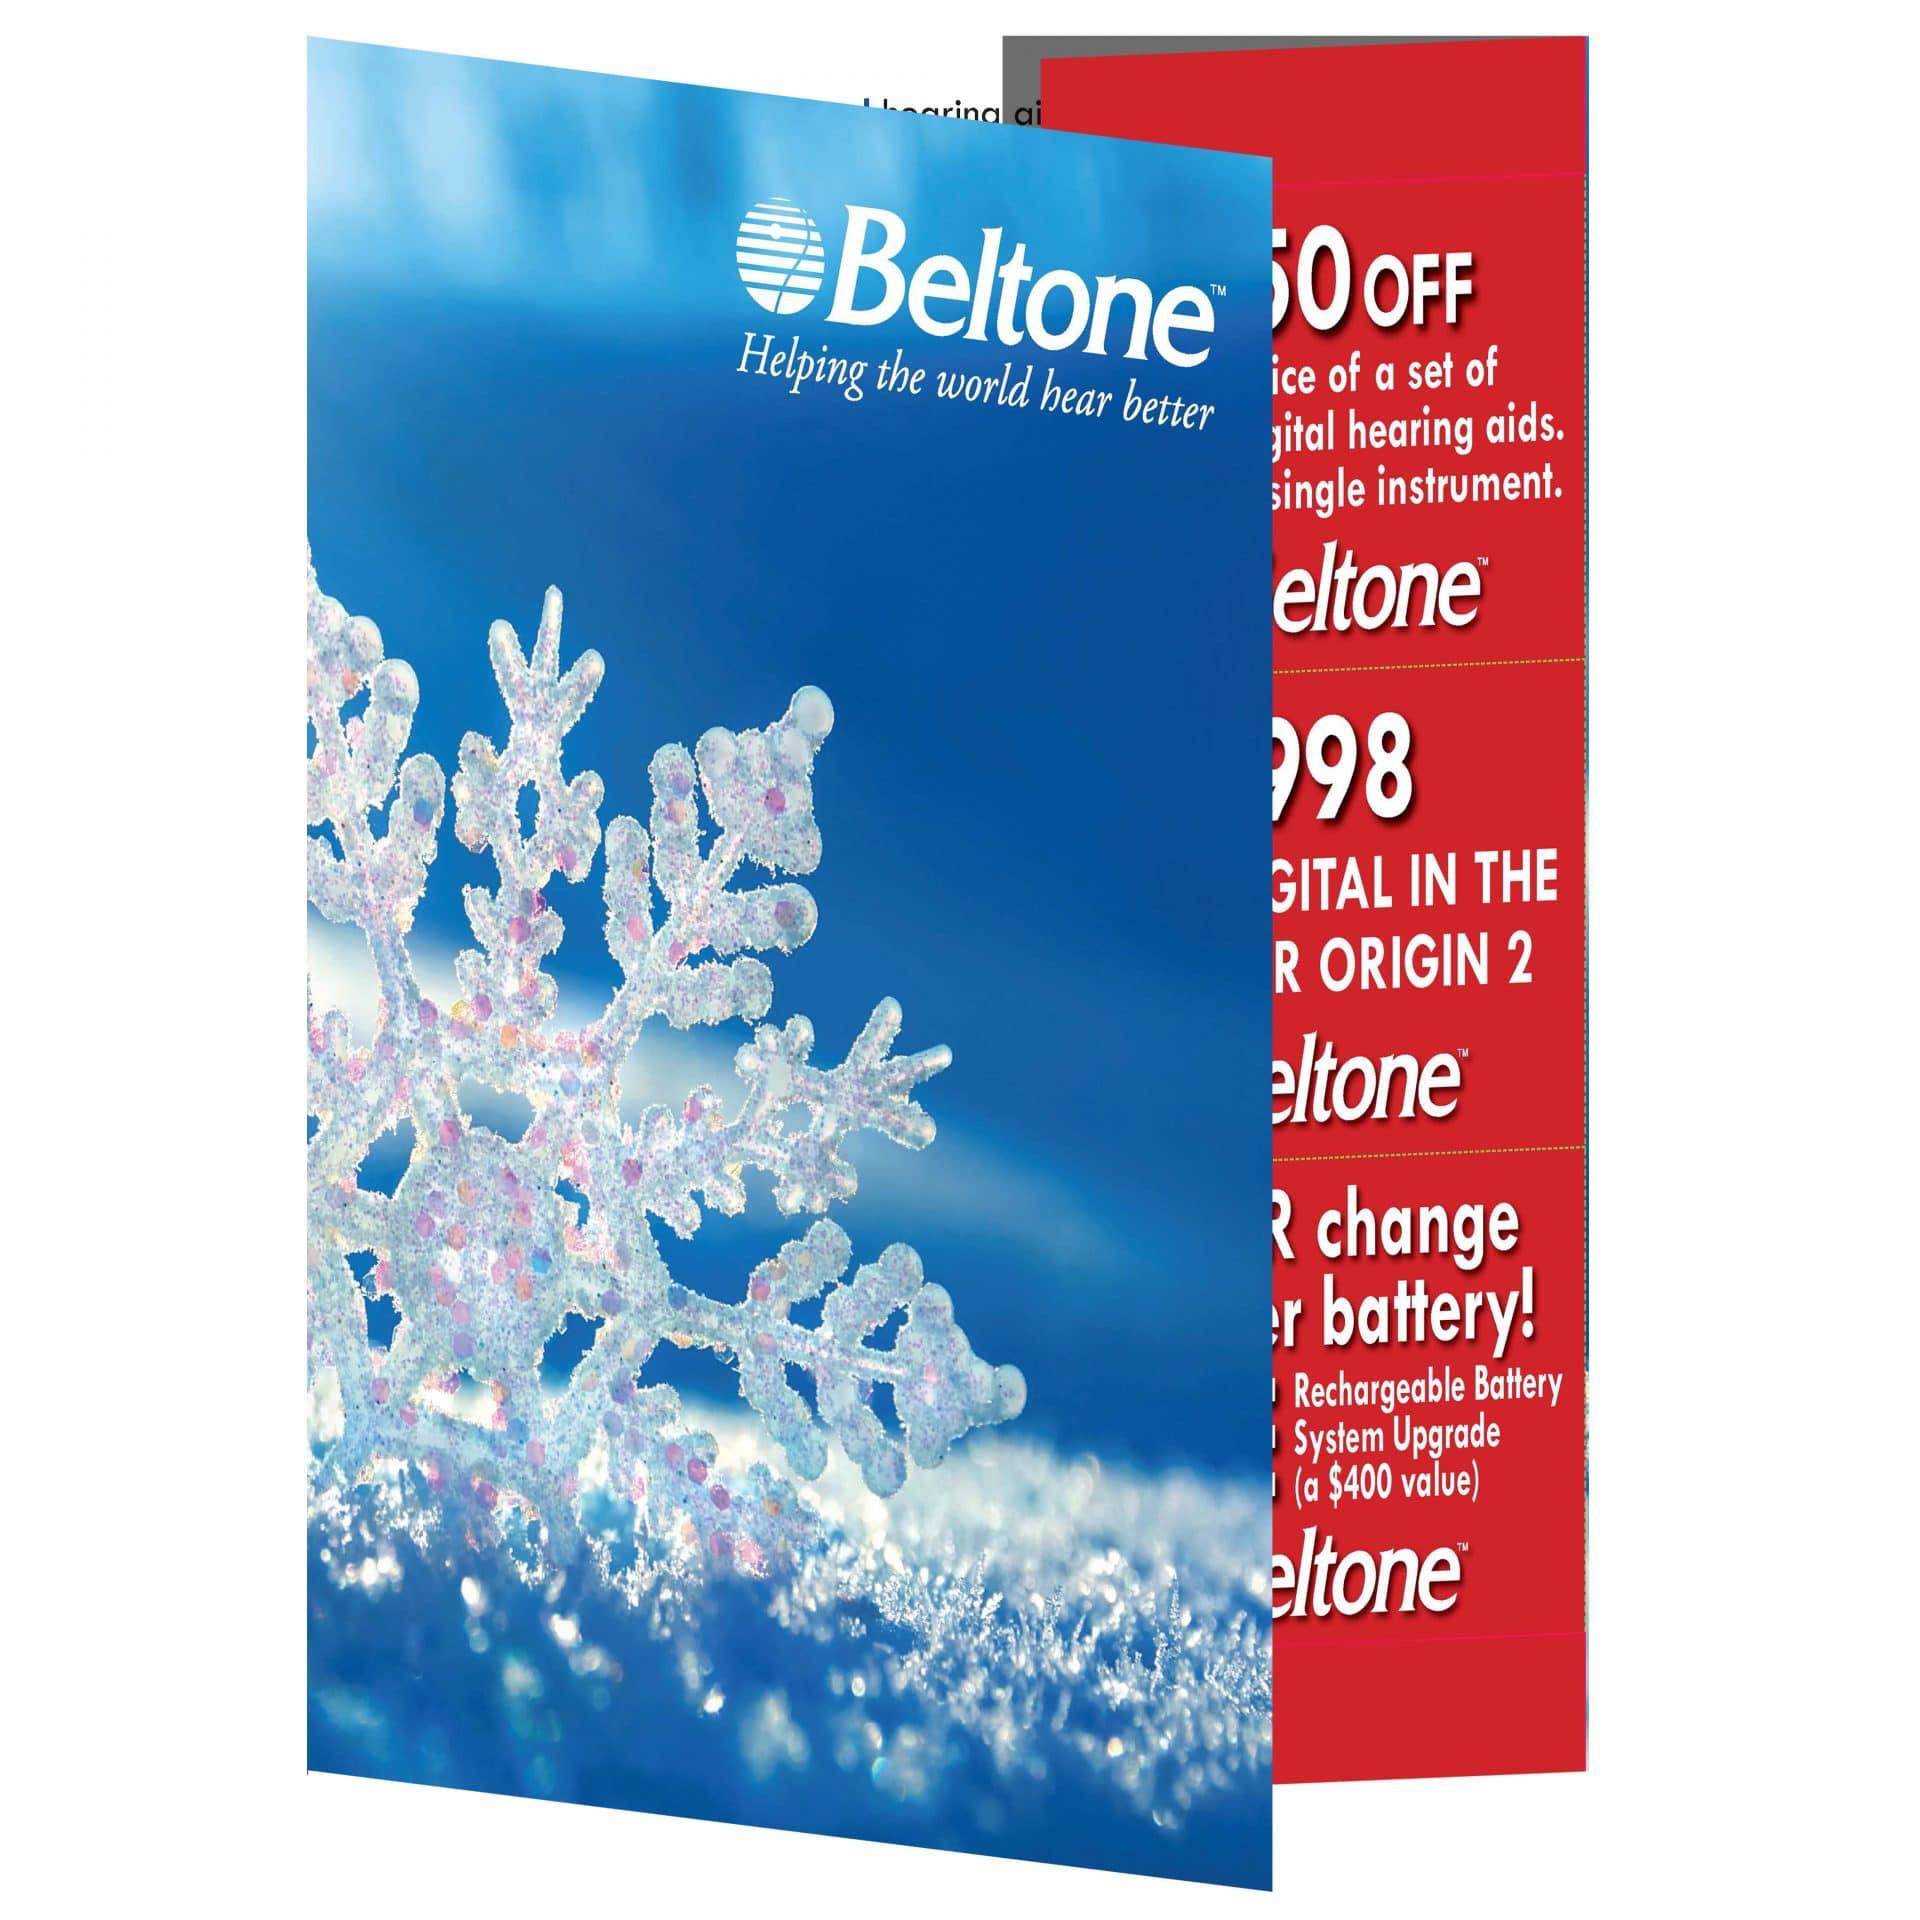 beltone_tri-card_mailer